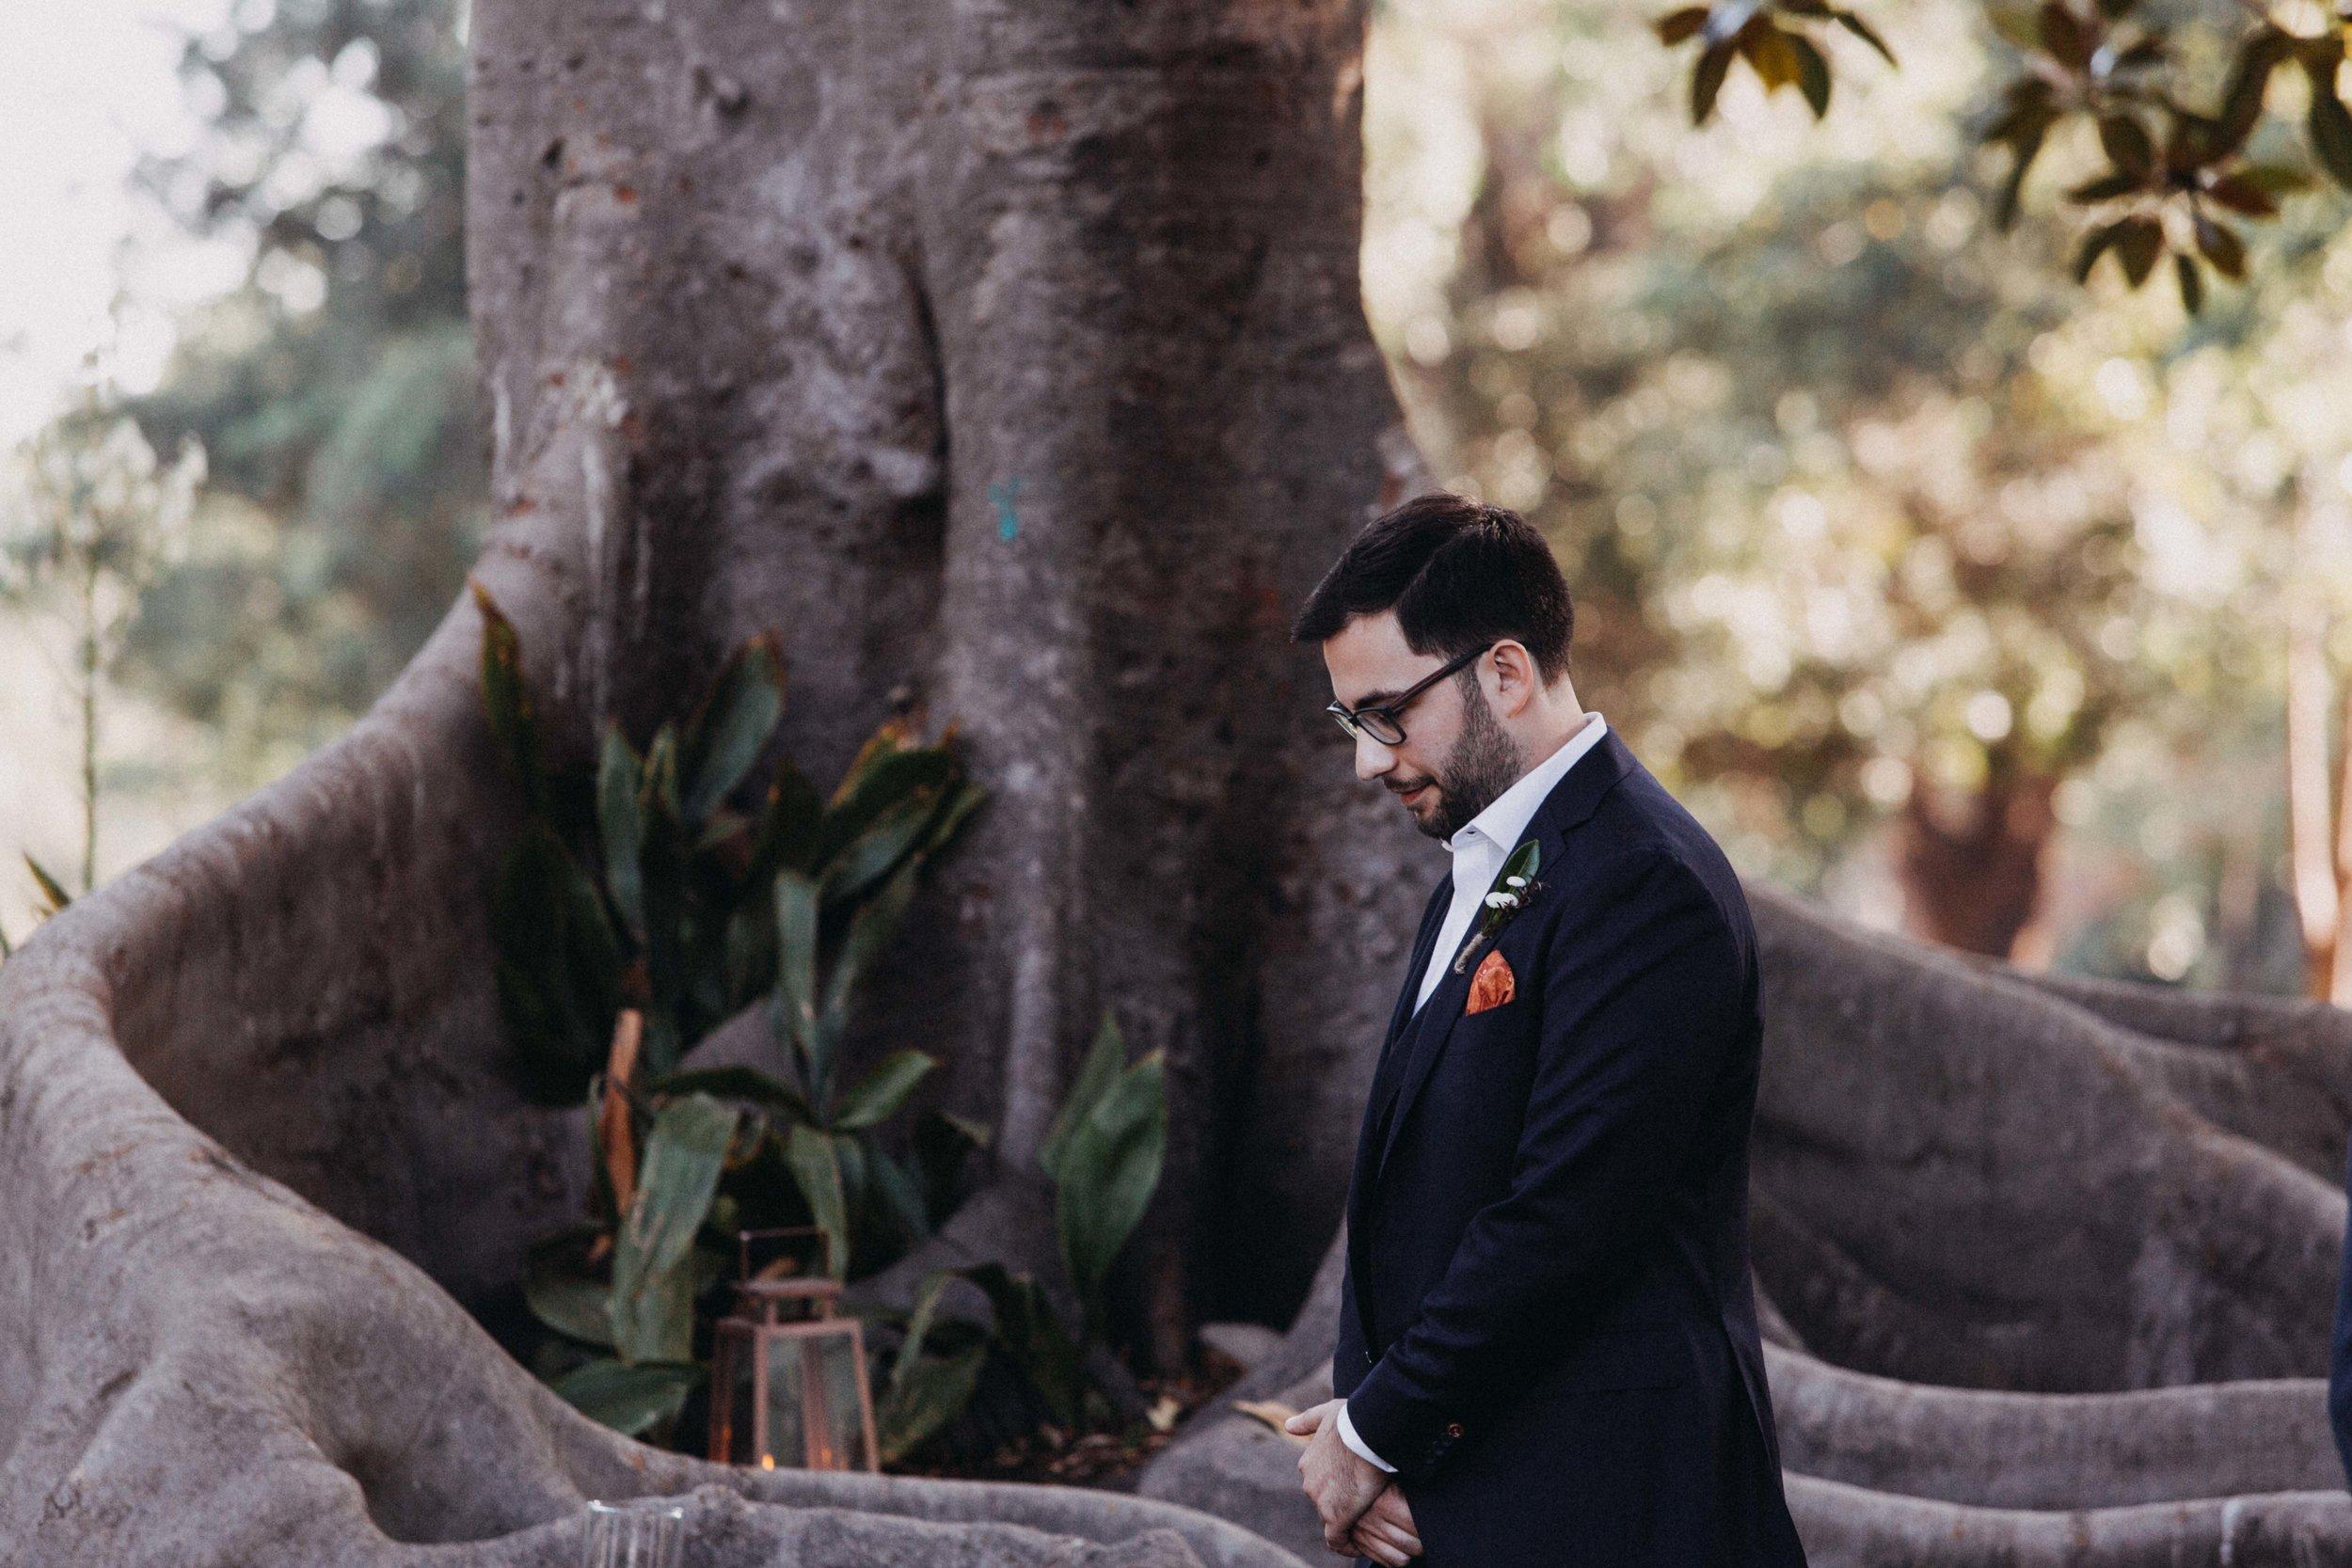 cabarita-park-sydney-wedding-emilyobrienphotography.net-11.jpg